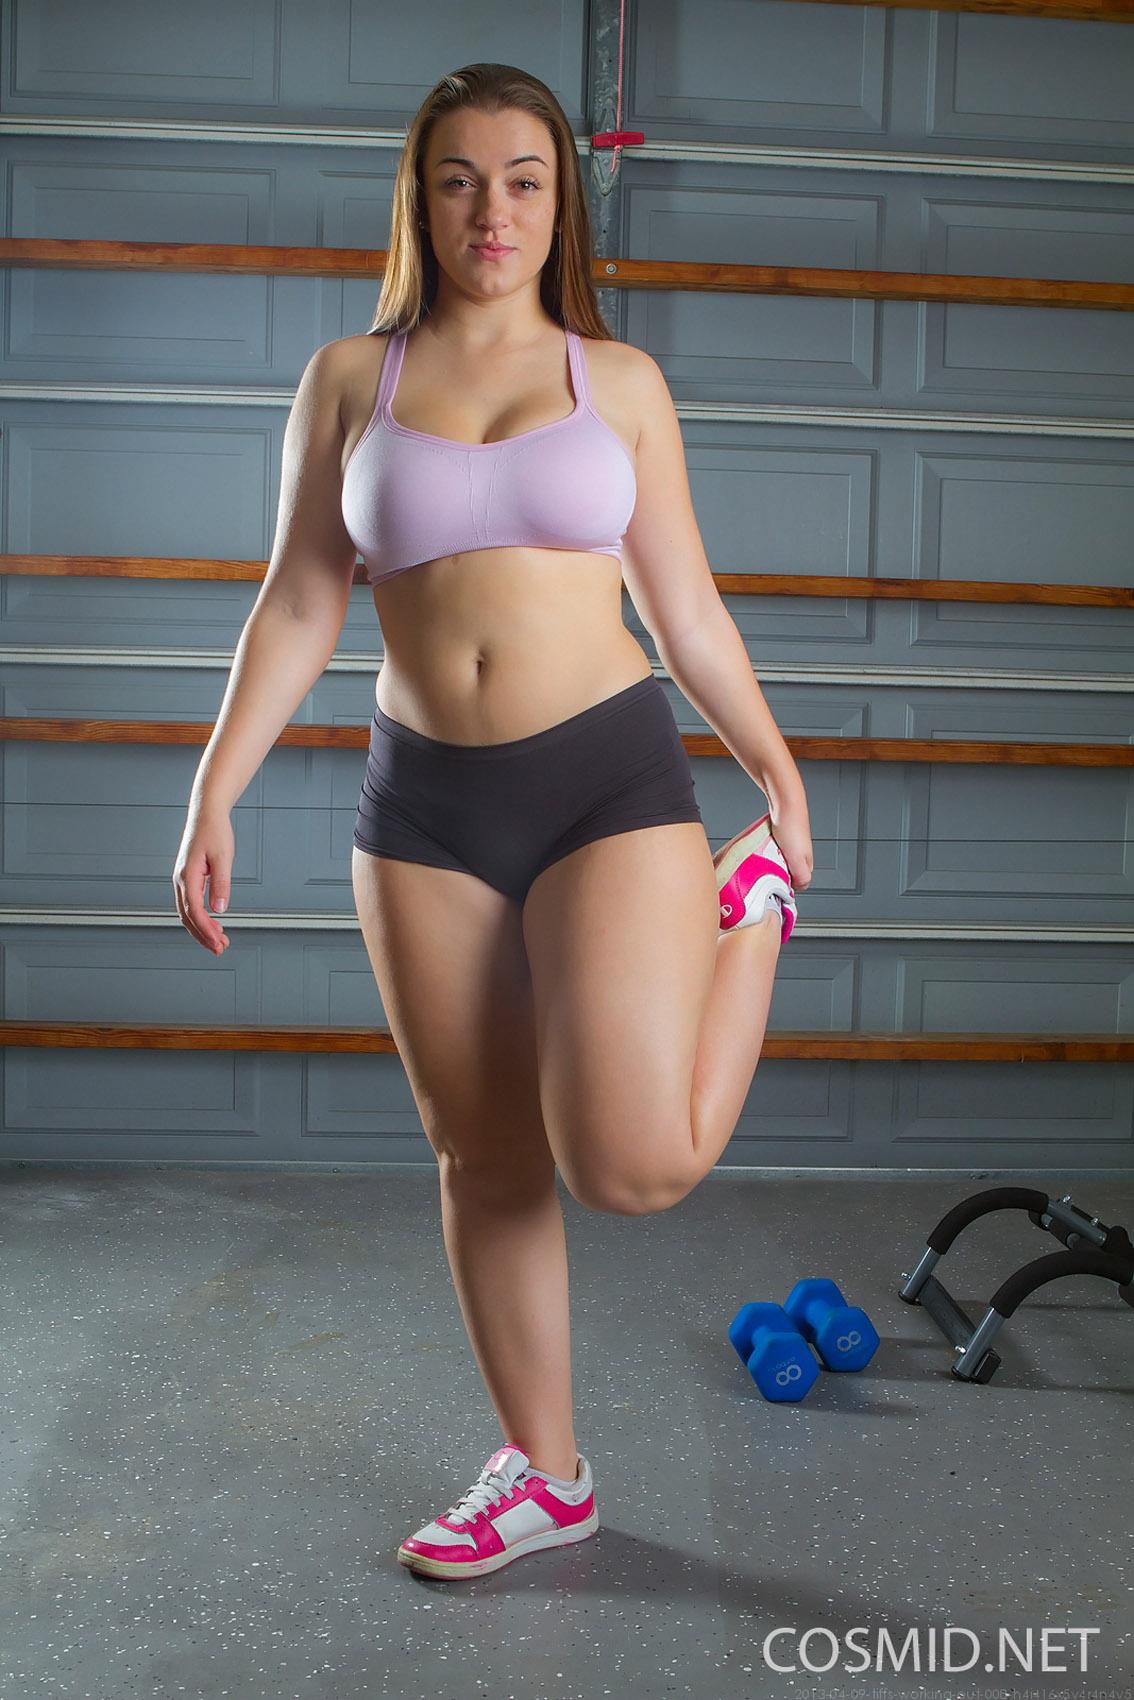 Huge boobs amateur brooklyn video see